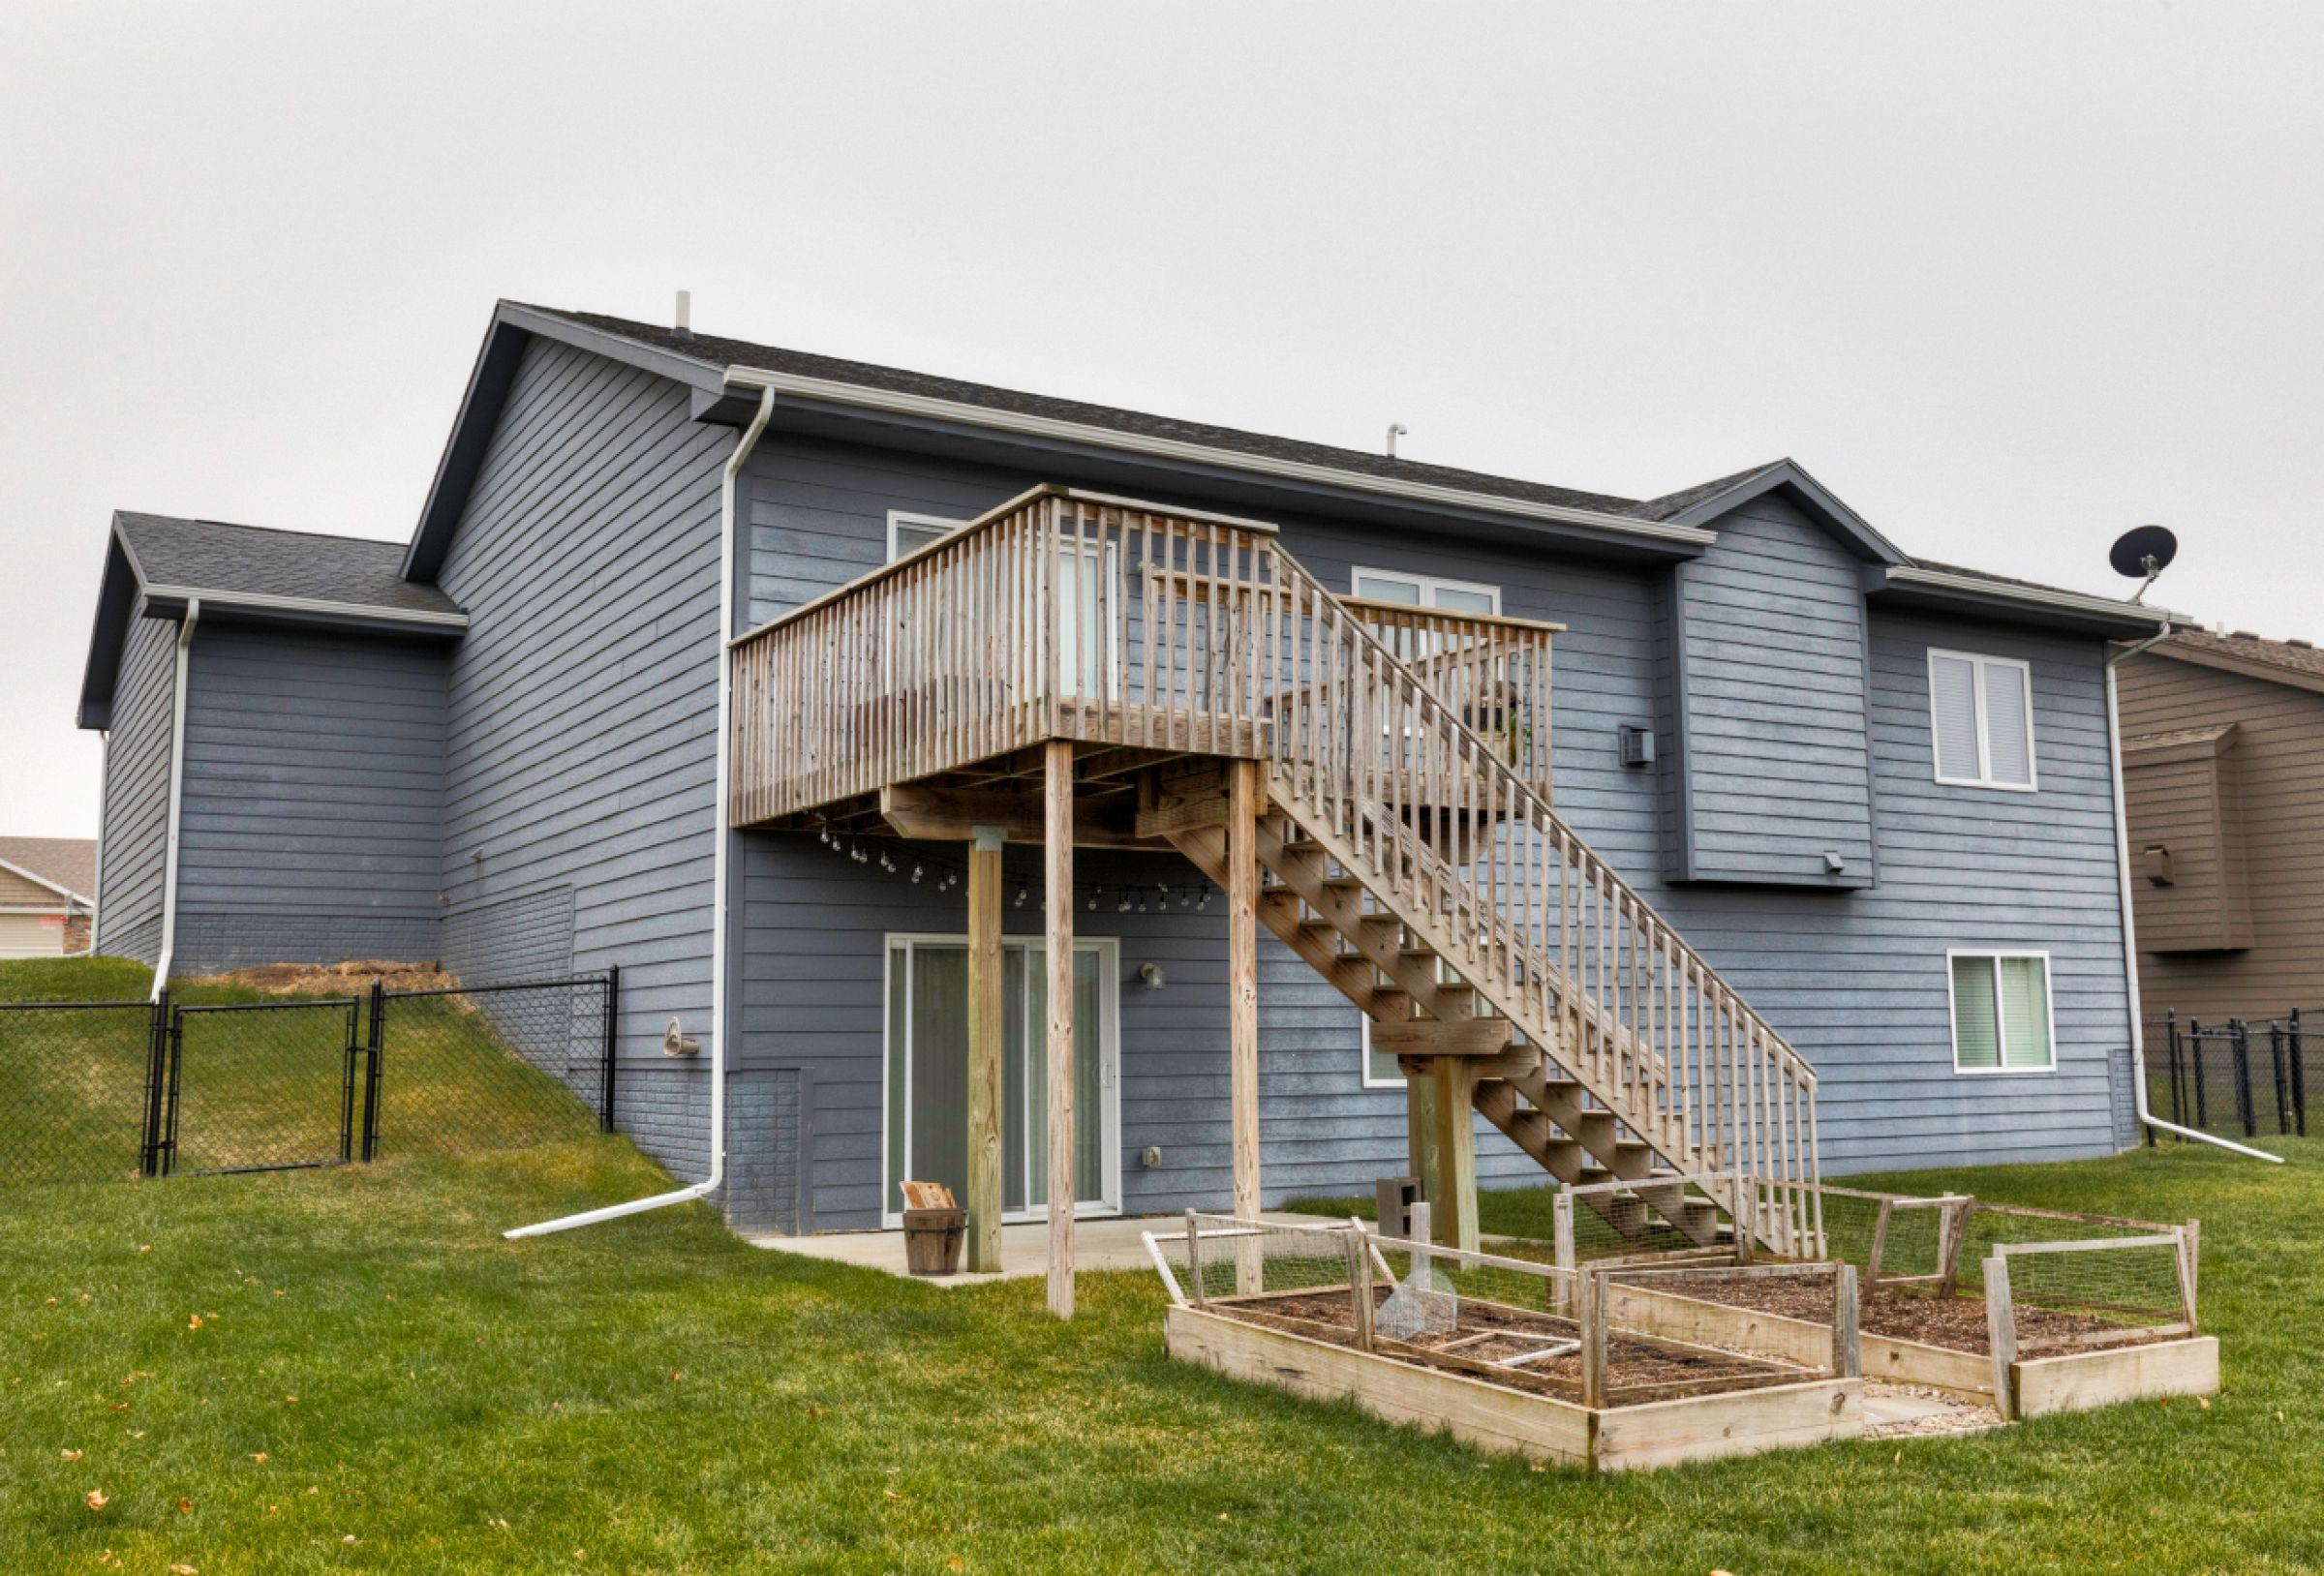 residential-polk-county-iowa-0-acres-listing-number-15273-1-2020-12-08-002824.jpg